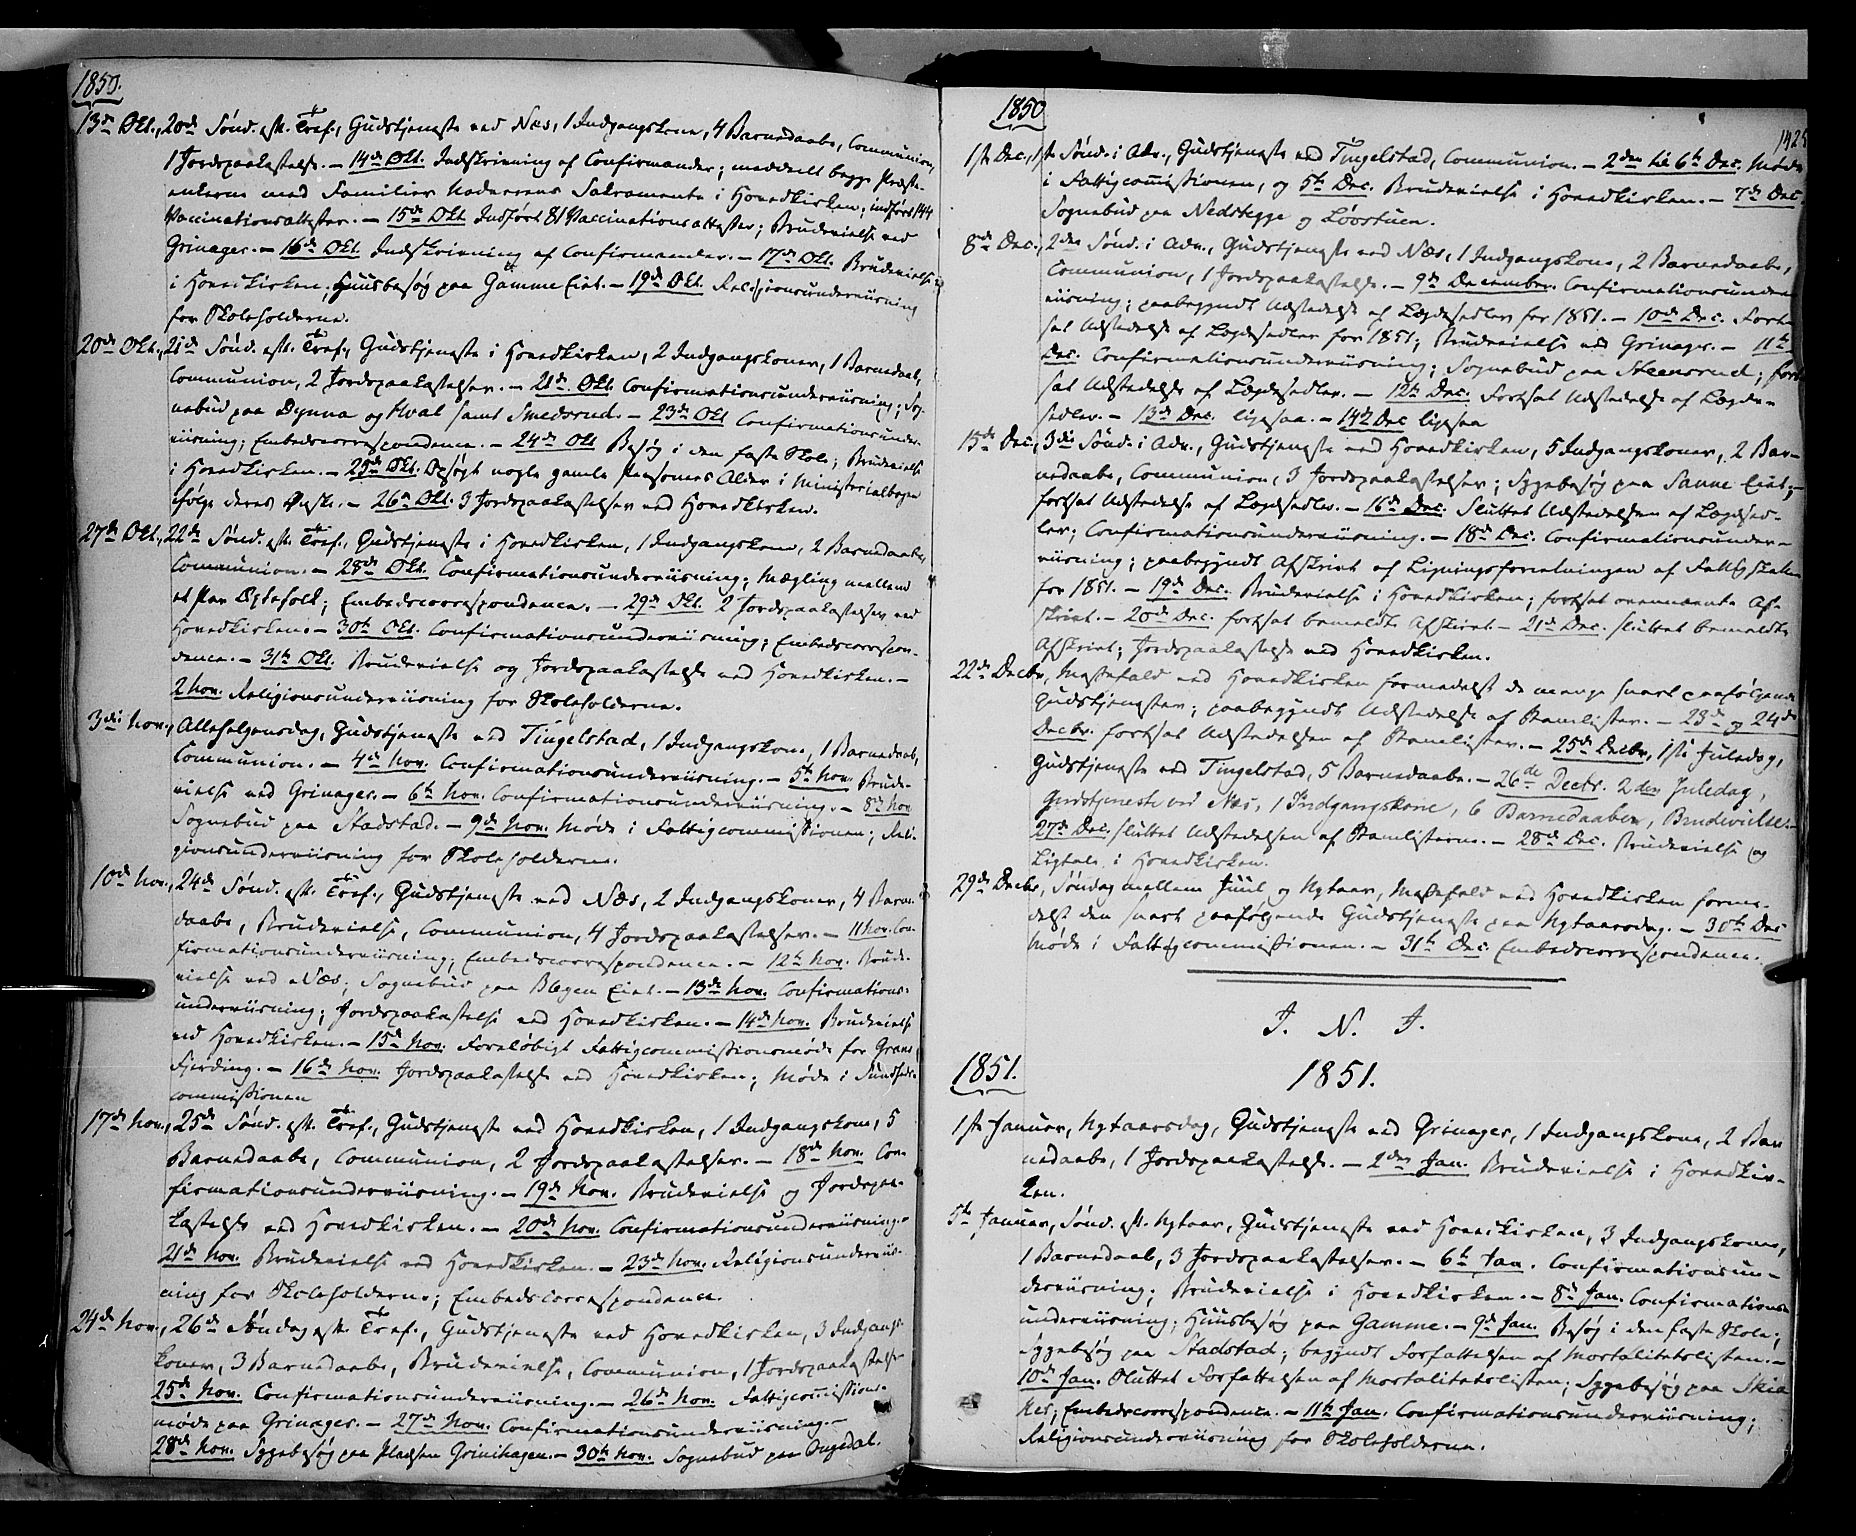 SAH, Gran prestekontor, Ministerialbok nr. 11, 1842-1856, s. 1424-1425